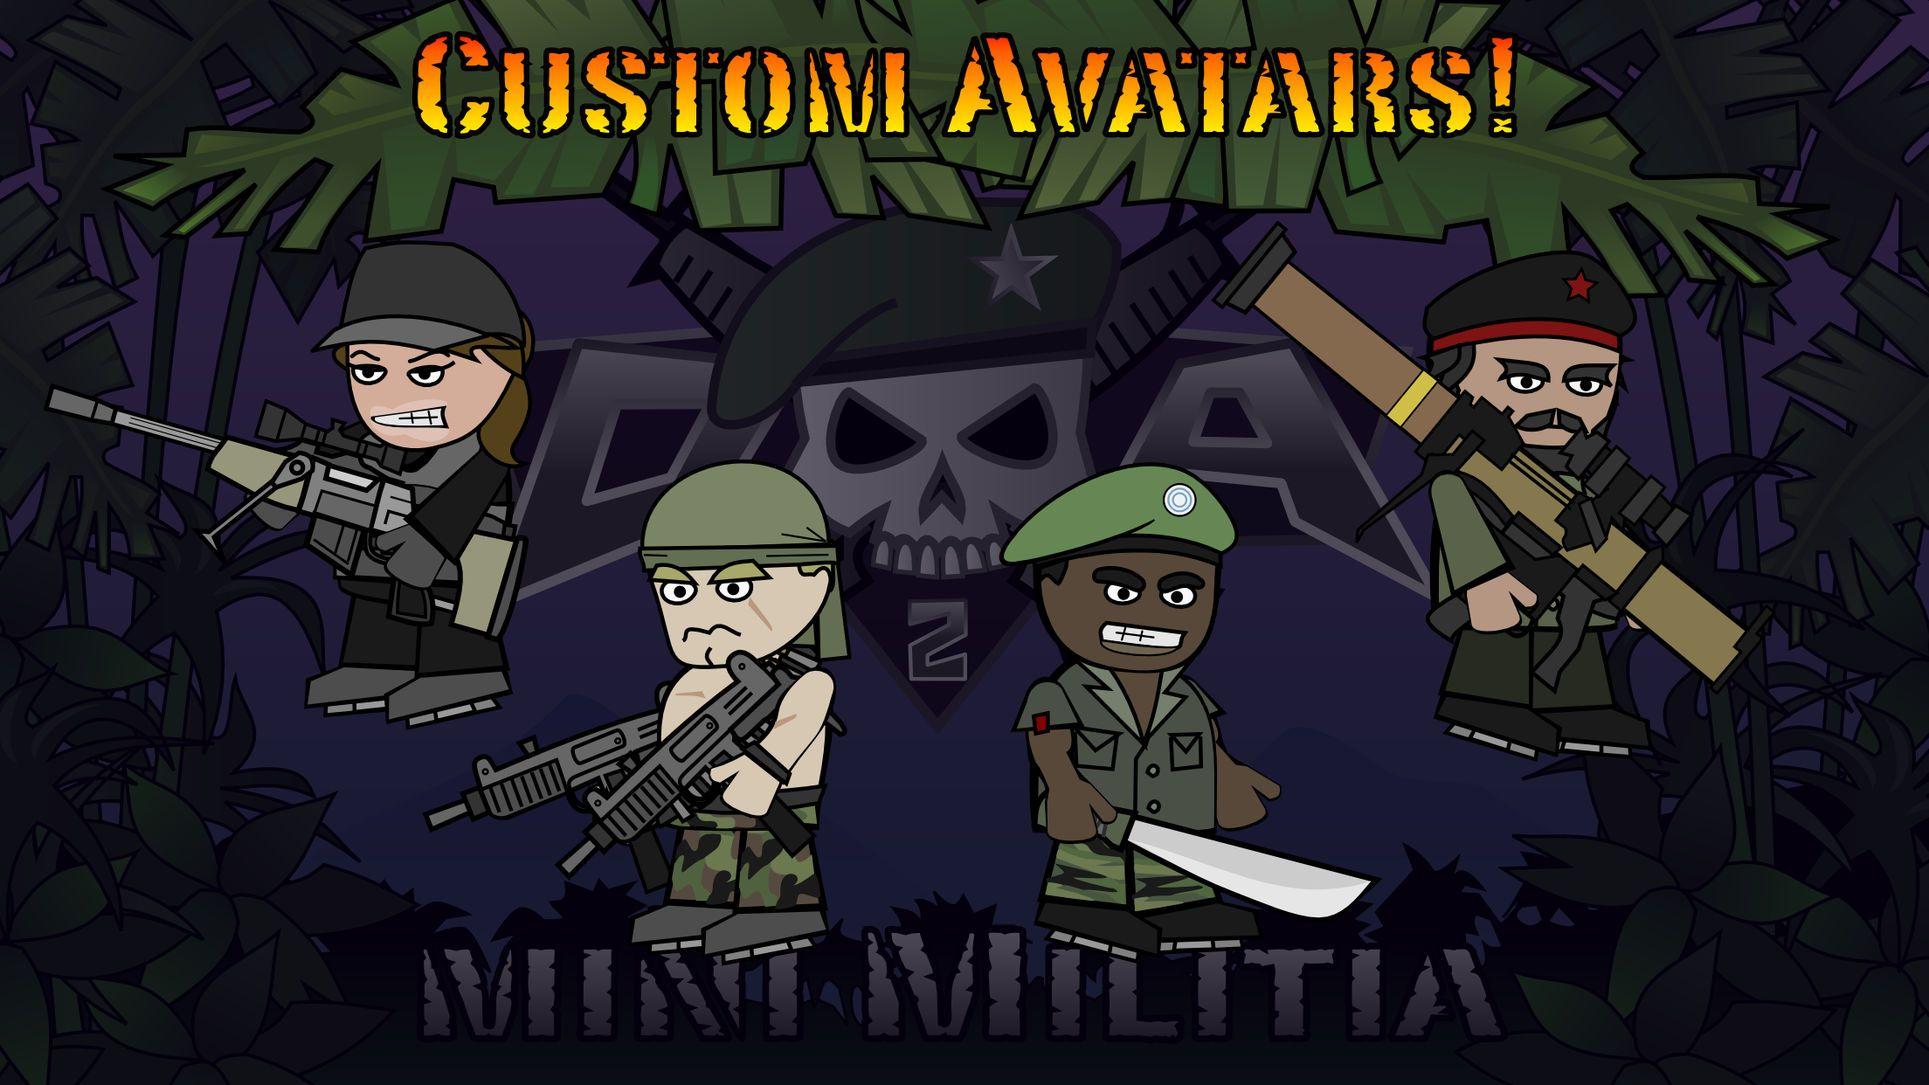 Doodle Army 2 Mini Militia Action Games Arcade Ios Doodles Mini Android Mobile Games